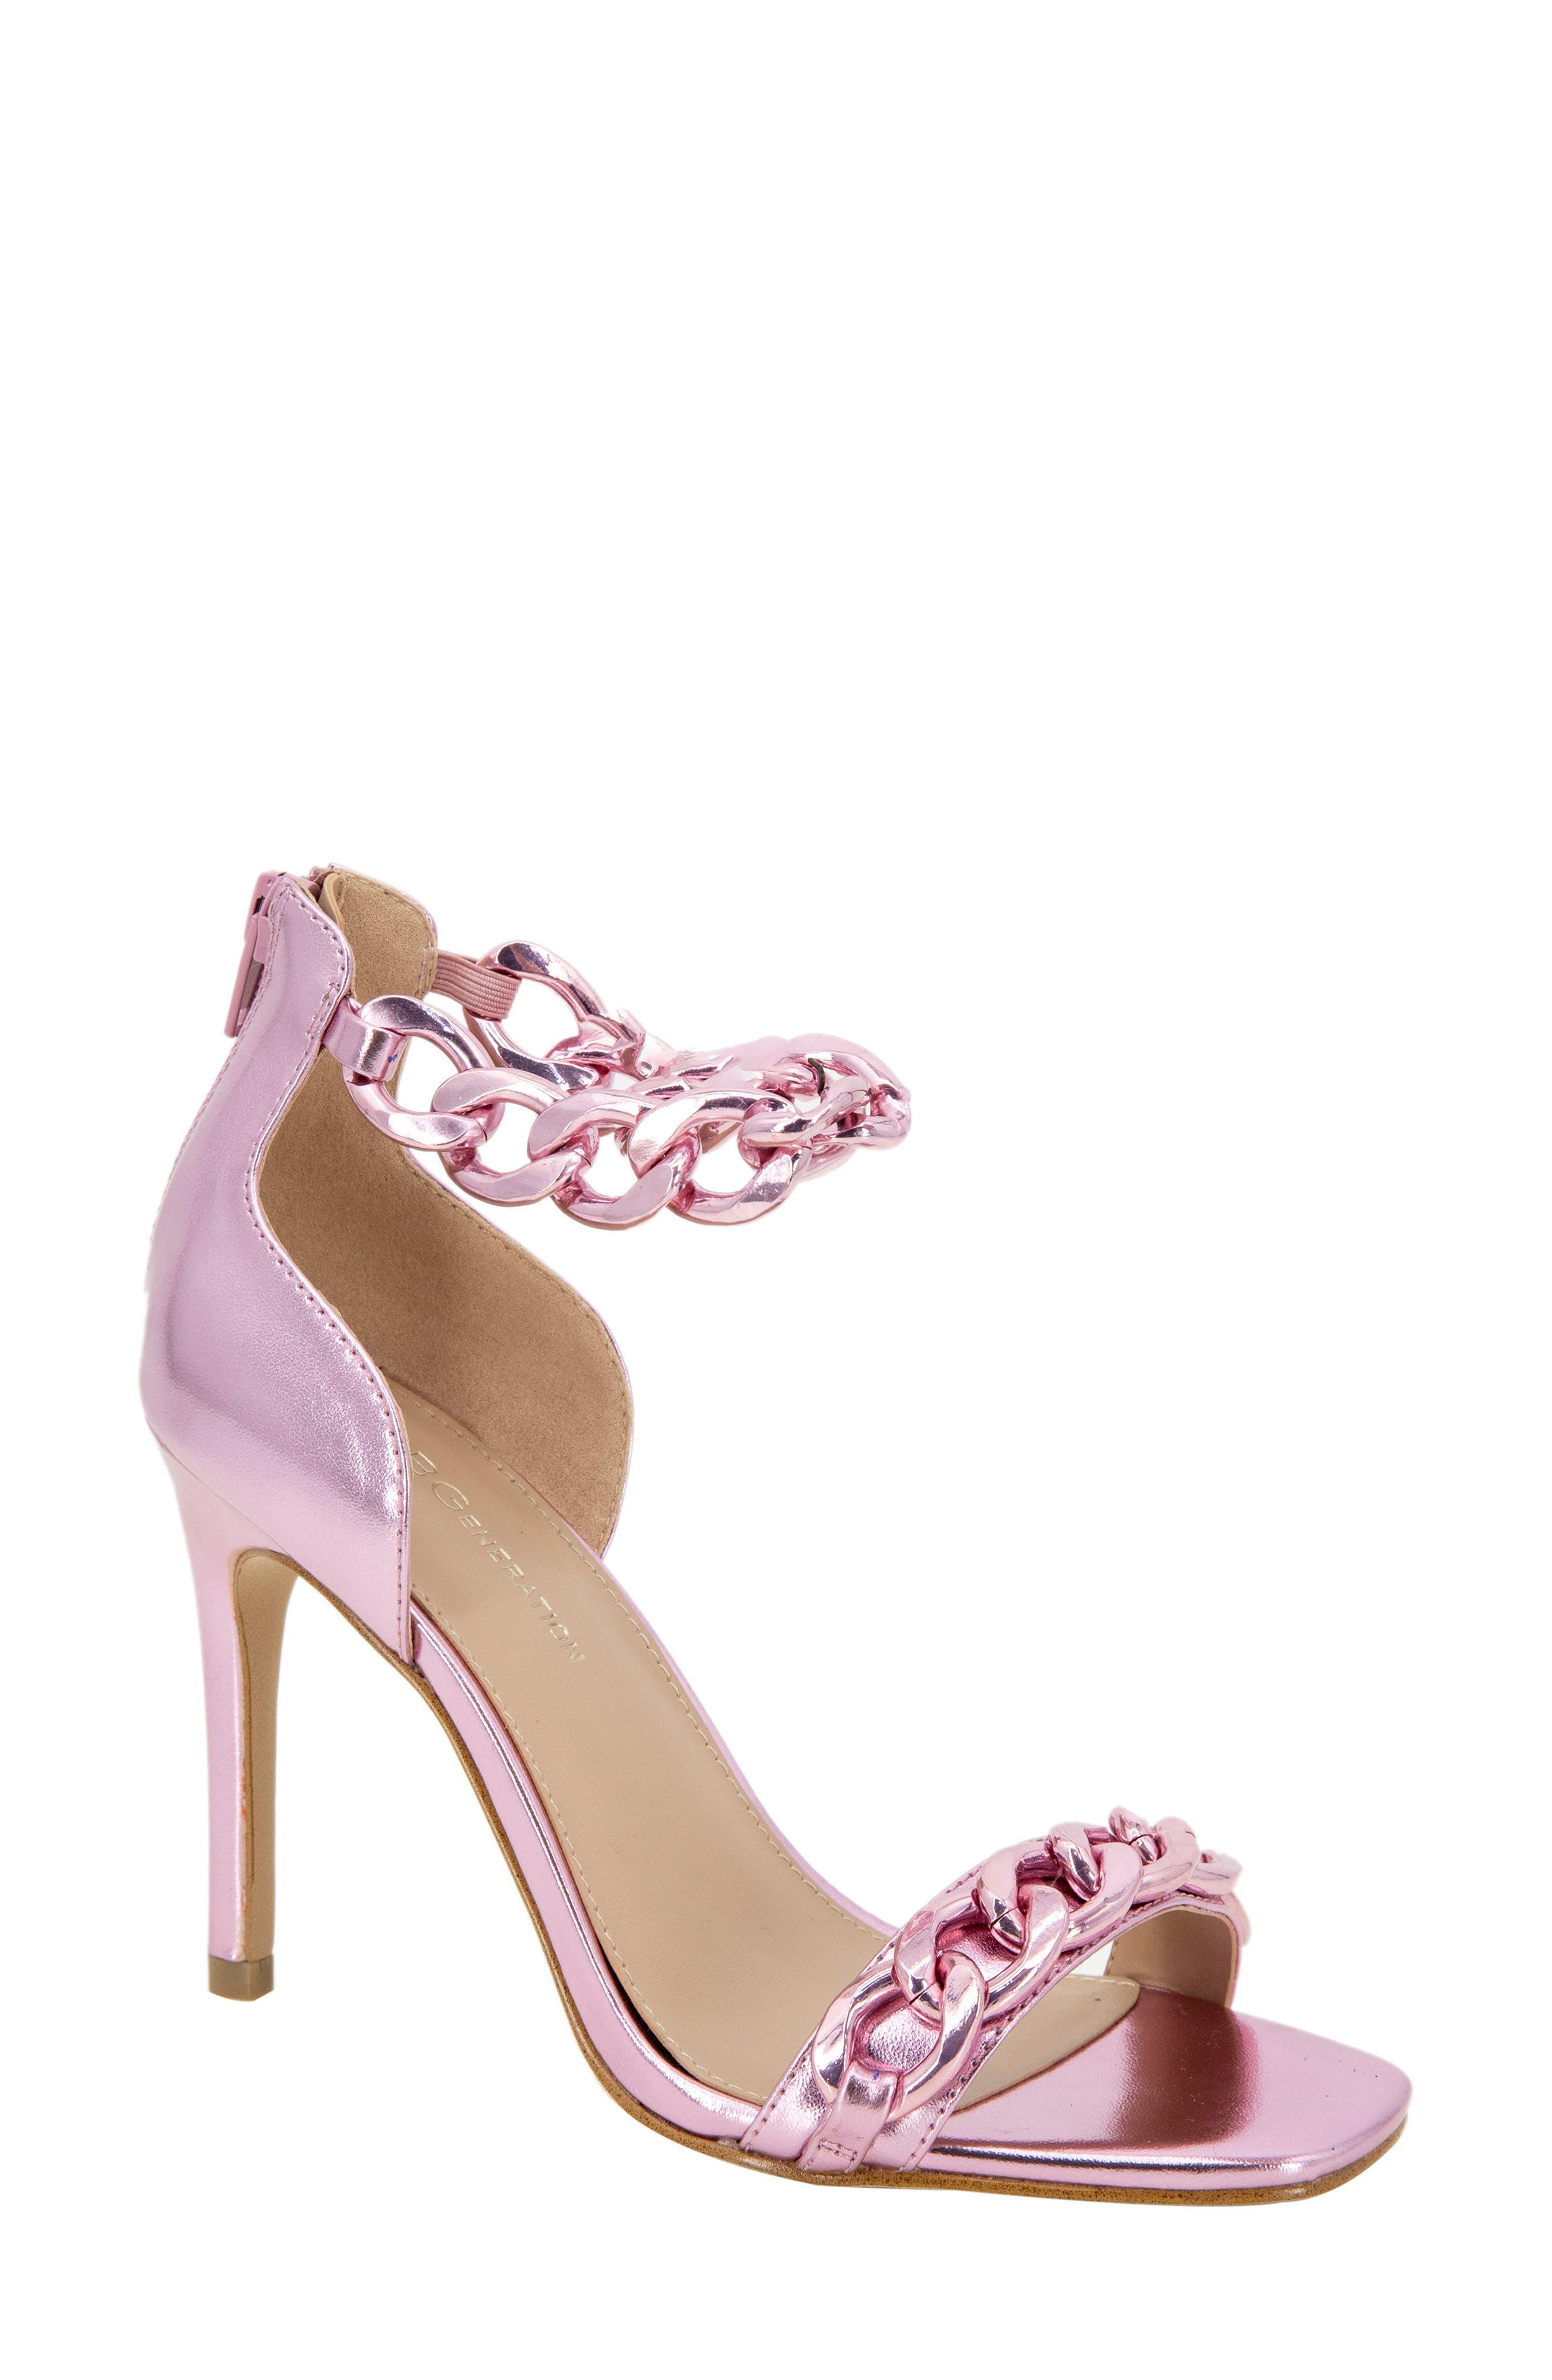 Isinna Chain Ankle Strap Sandal